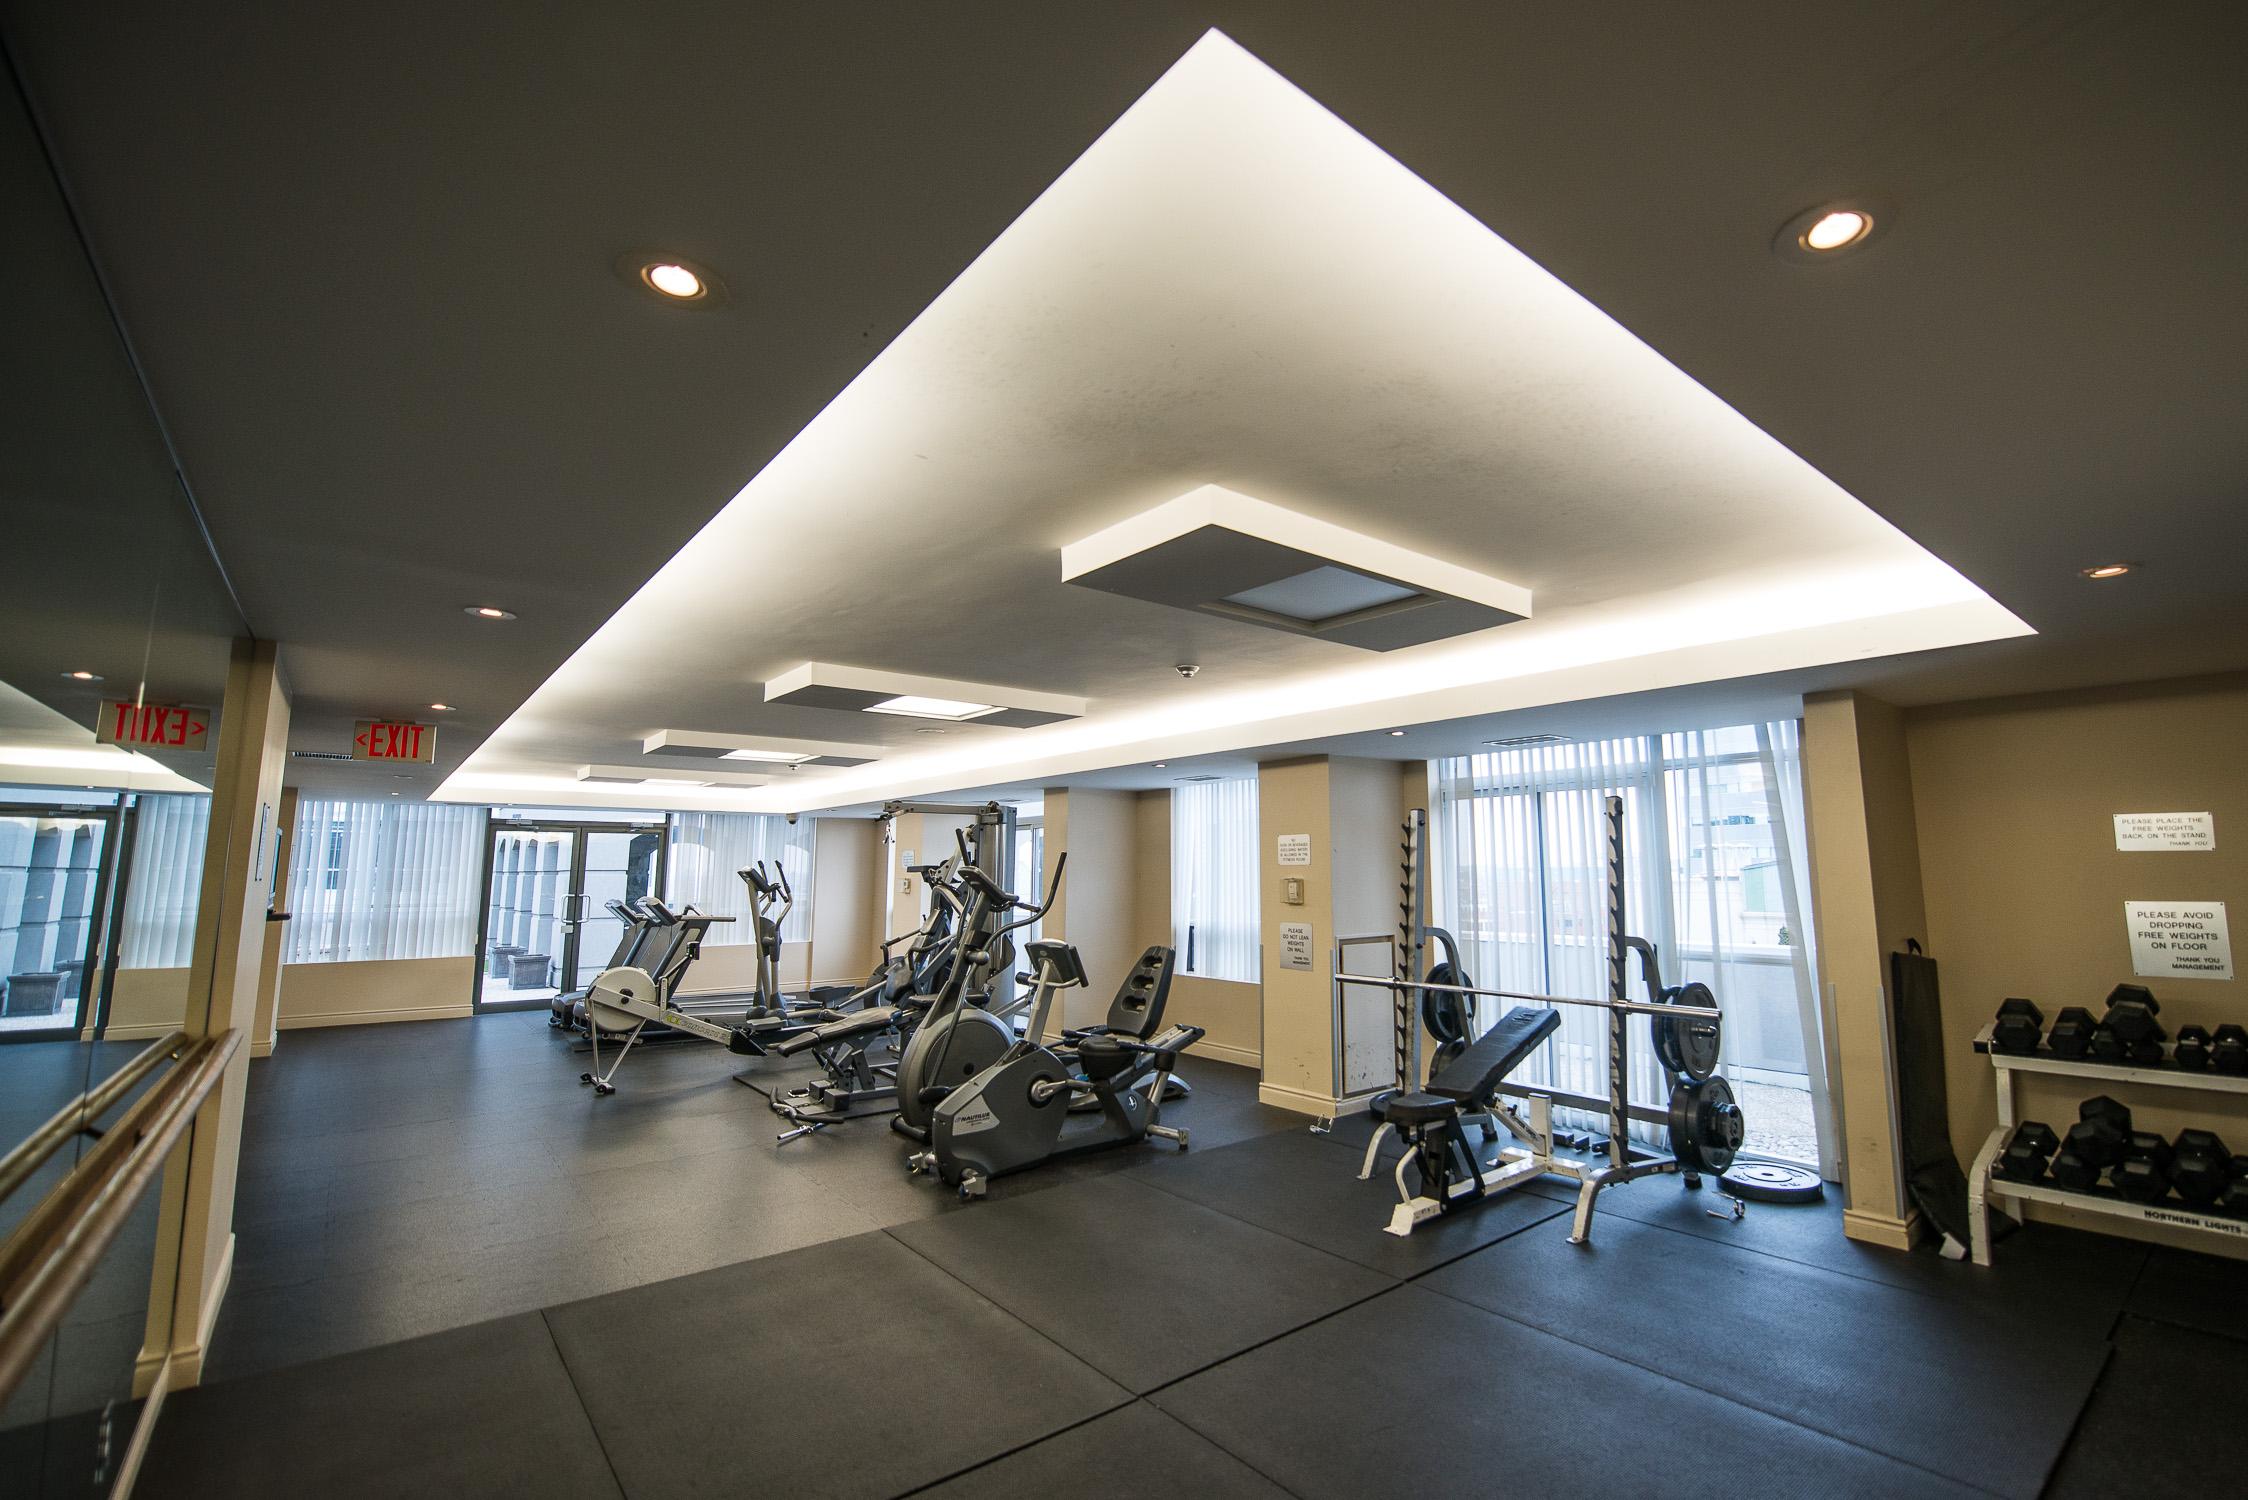 furnished apartments toronto university plaza fitness centre